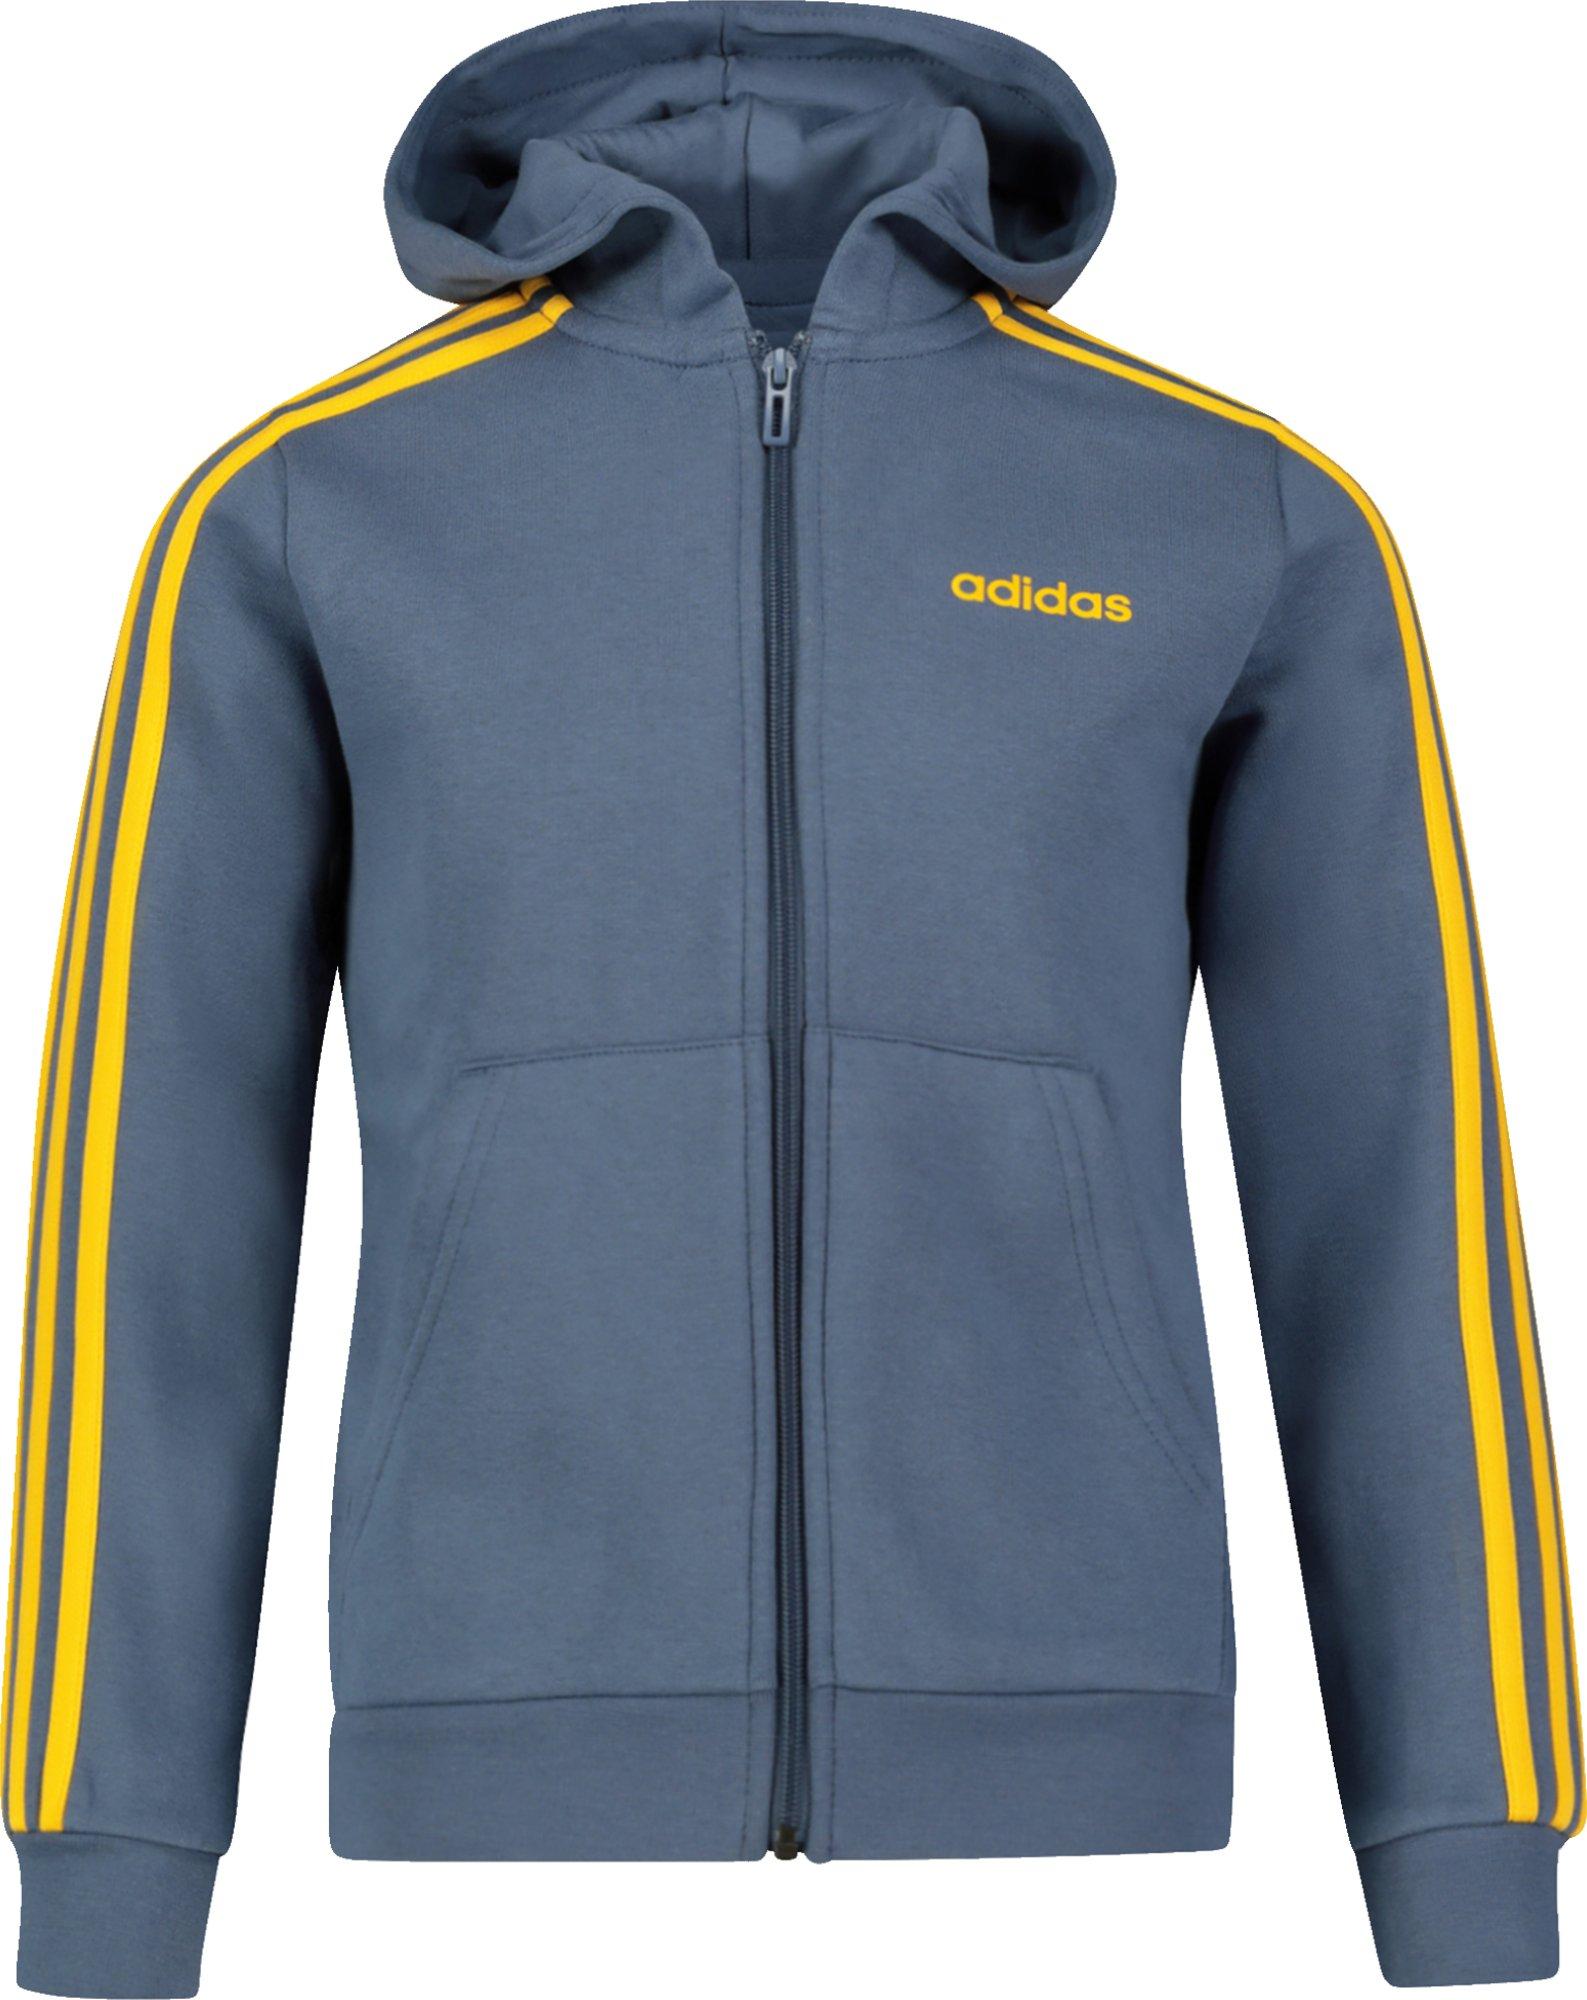 Adidas Essentials 3 stripes Hoodie (Barnjunior)